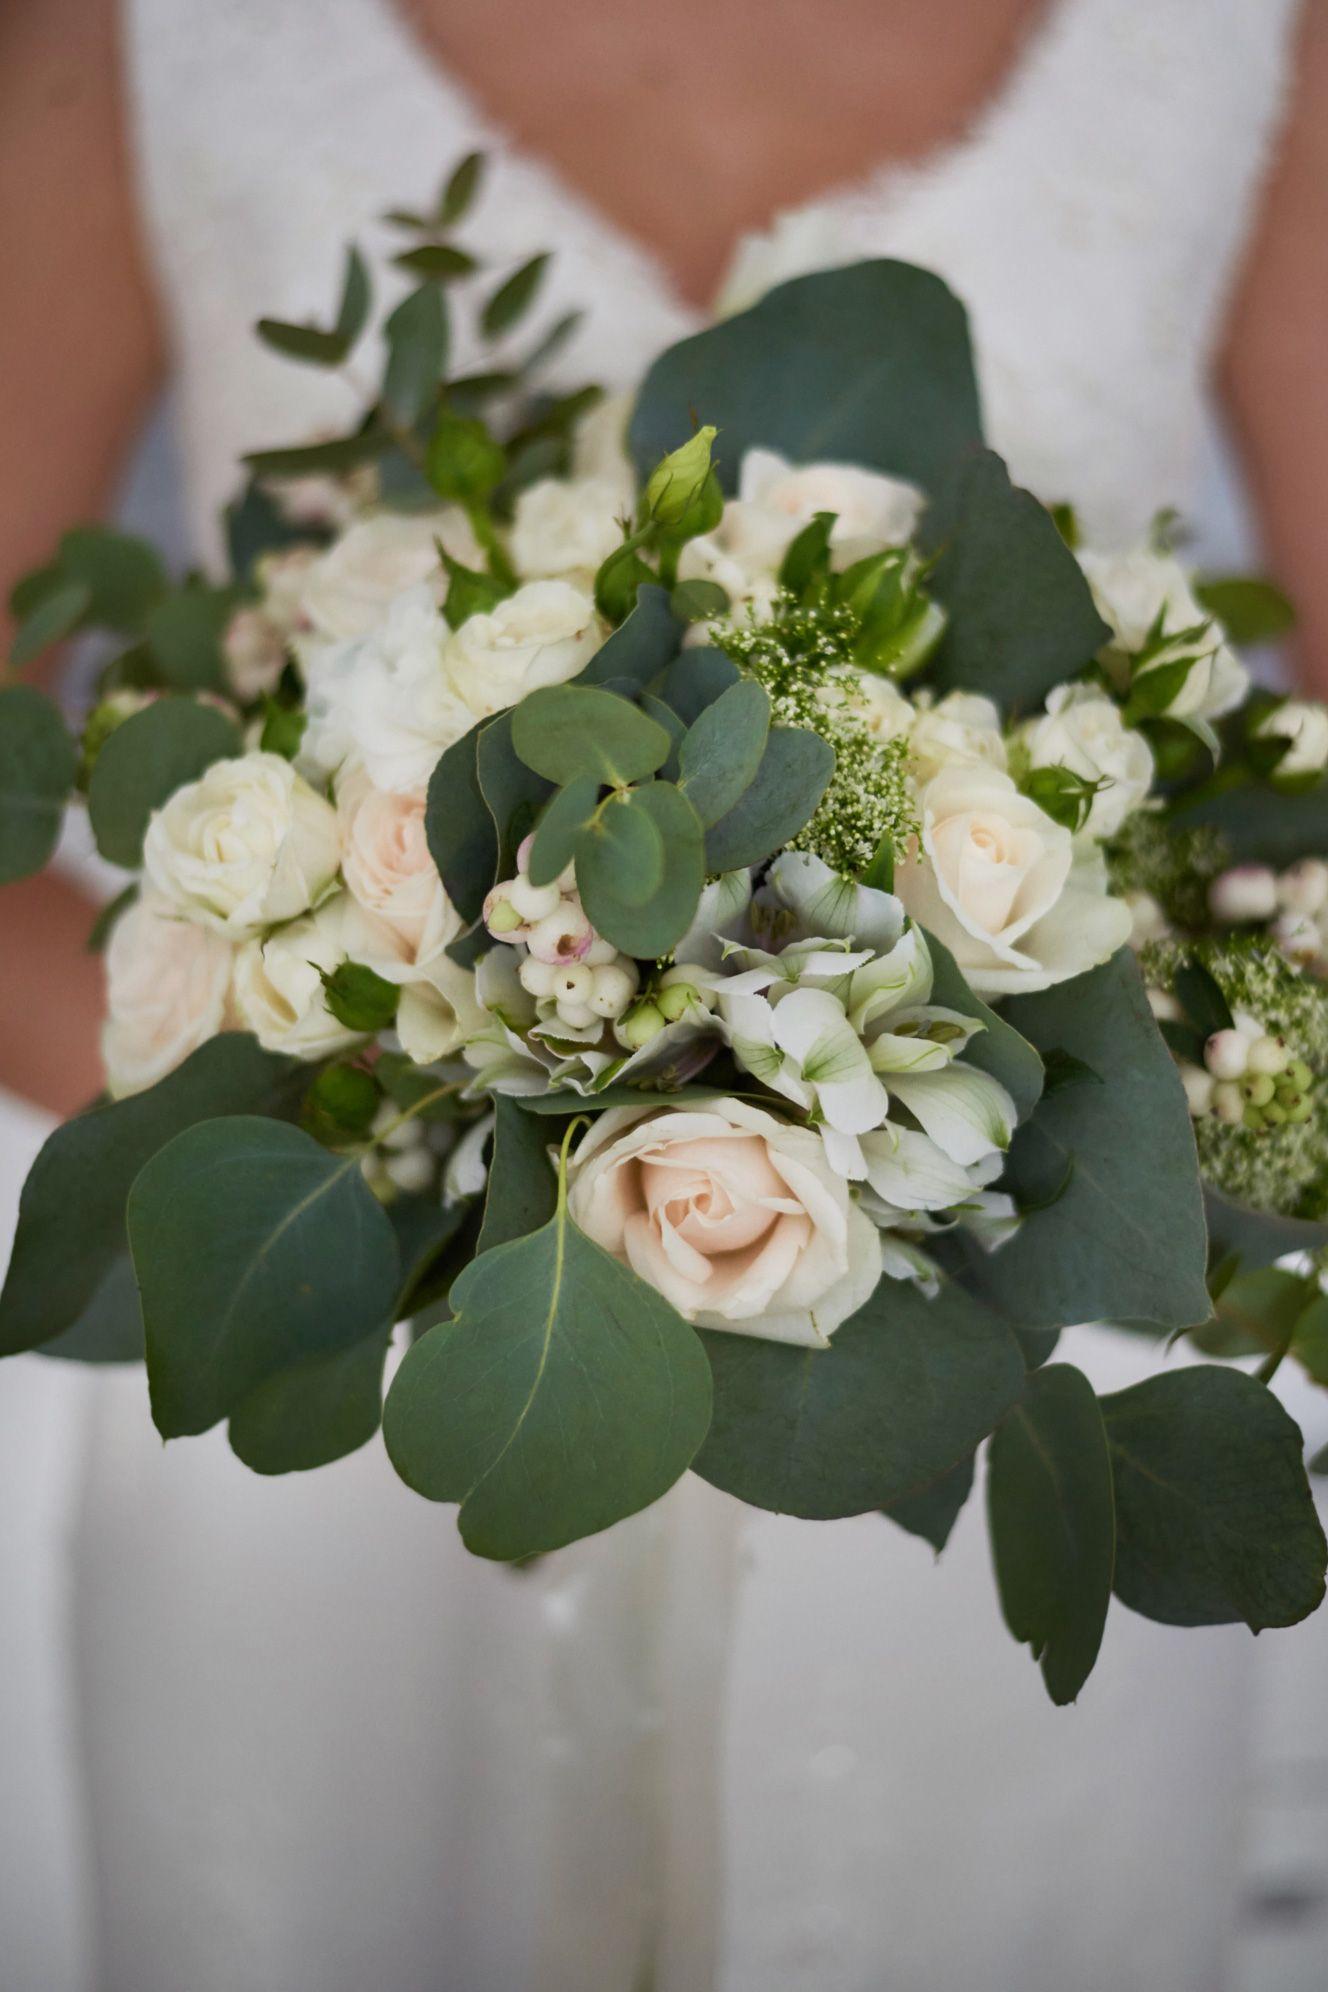 Bukiet Dla Panny Mlodej Floral Floral Wreath Wreaths